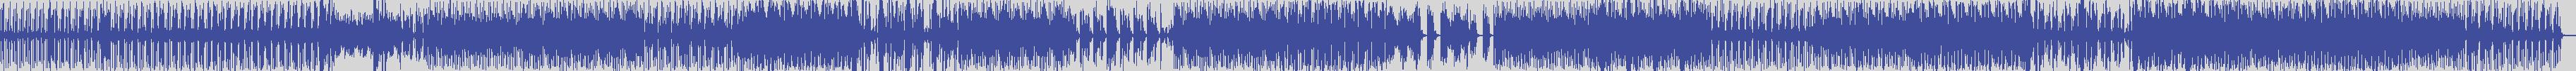 just_digital_records [JS1143] Homeboyz - Crazy Dj [Funk Phenomena Mix] audio wave form